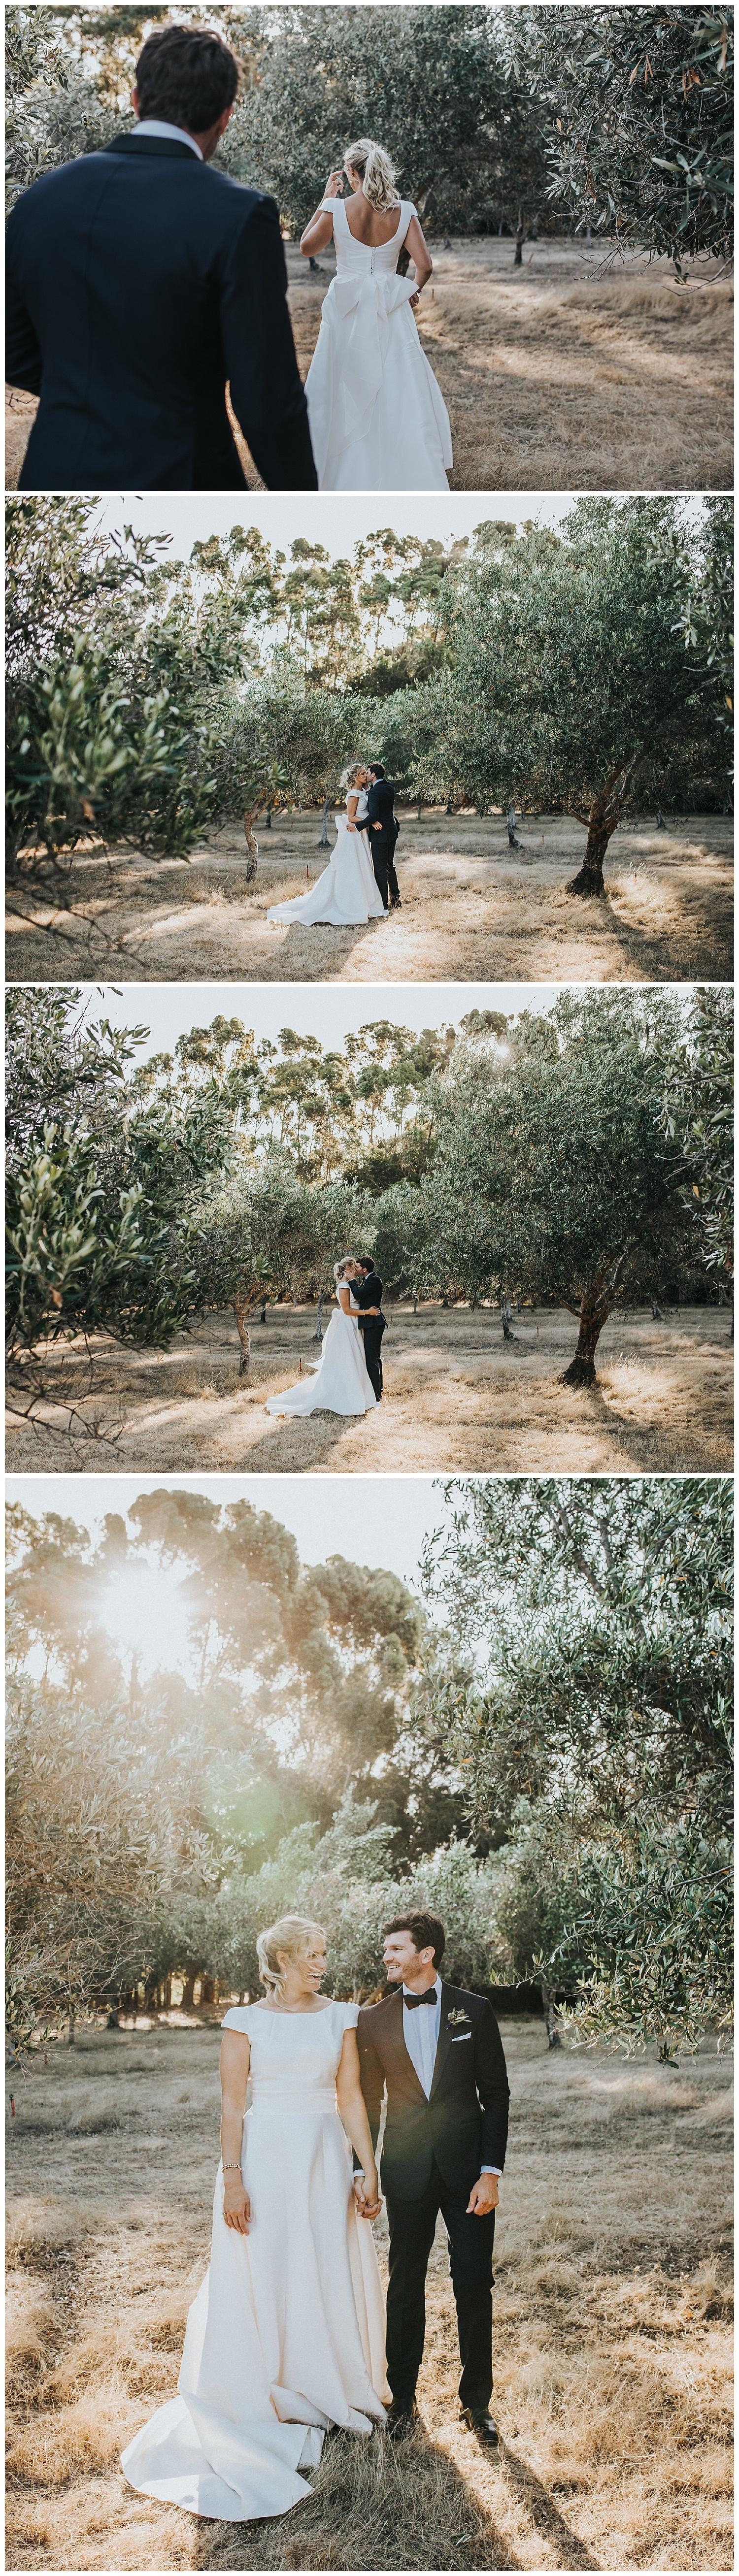 olio_bello_wedding_keeper_creative_021.JPG